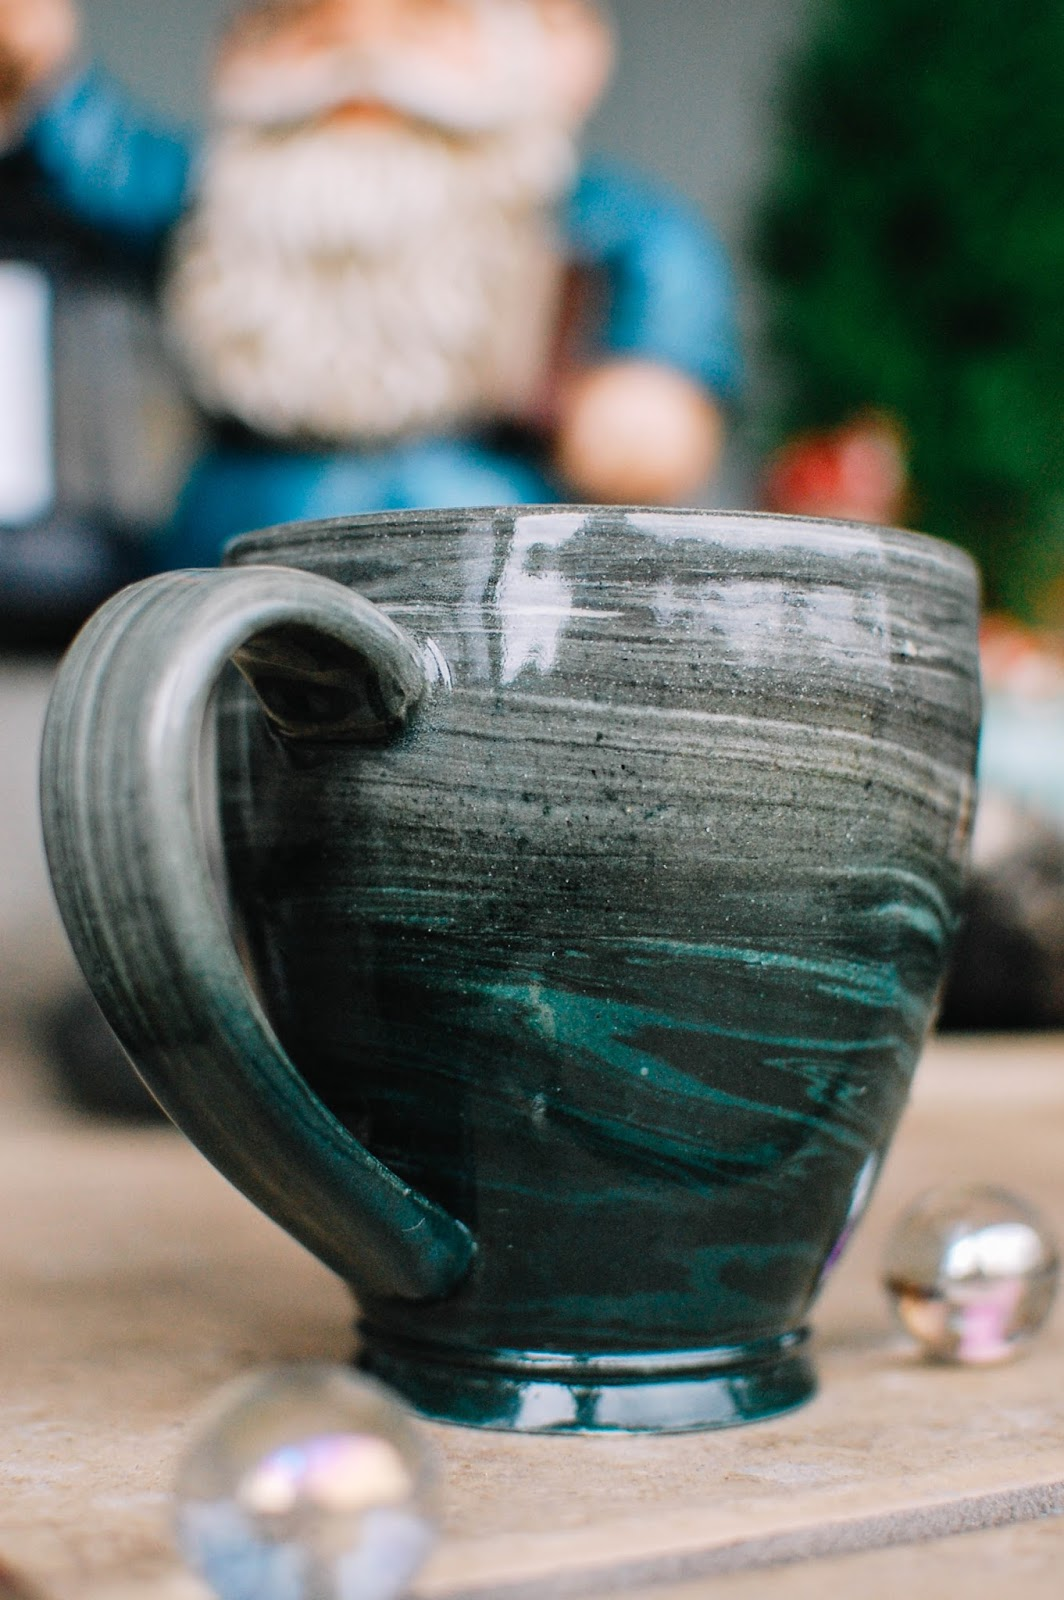 The Redolent Mermaid Hand To Earth Ceramics Mug And Bowl